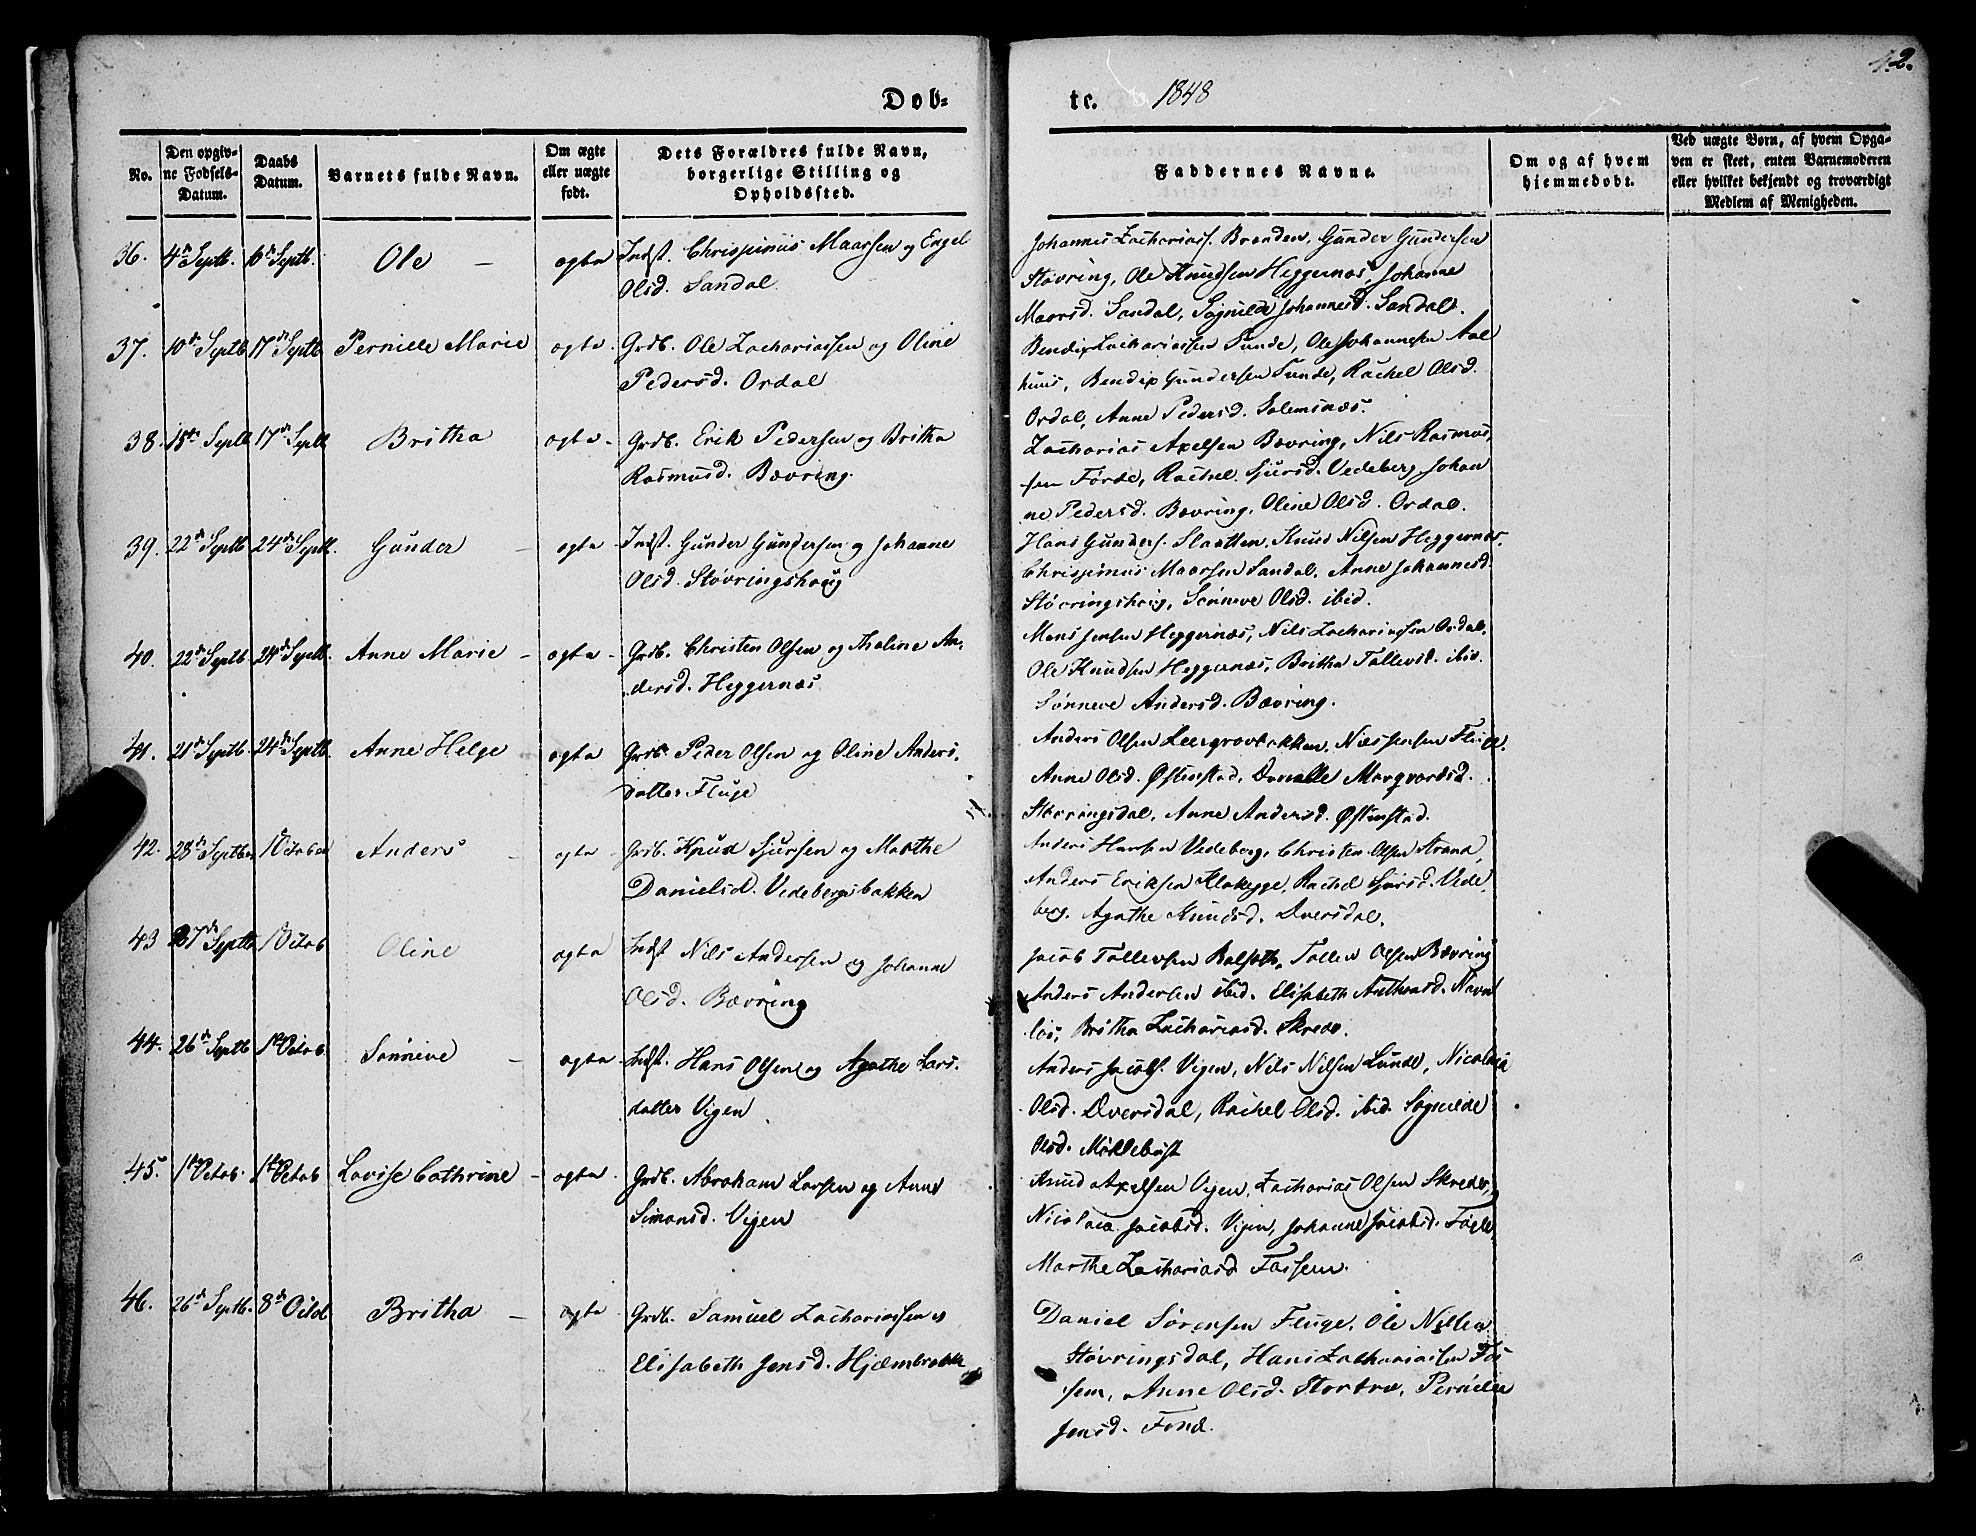 SAB, Jølster sokneprestembete, H/Haa/Haaa/L0010: Parish register (official) no. A 10, 1847-1865, p. 2